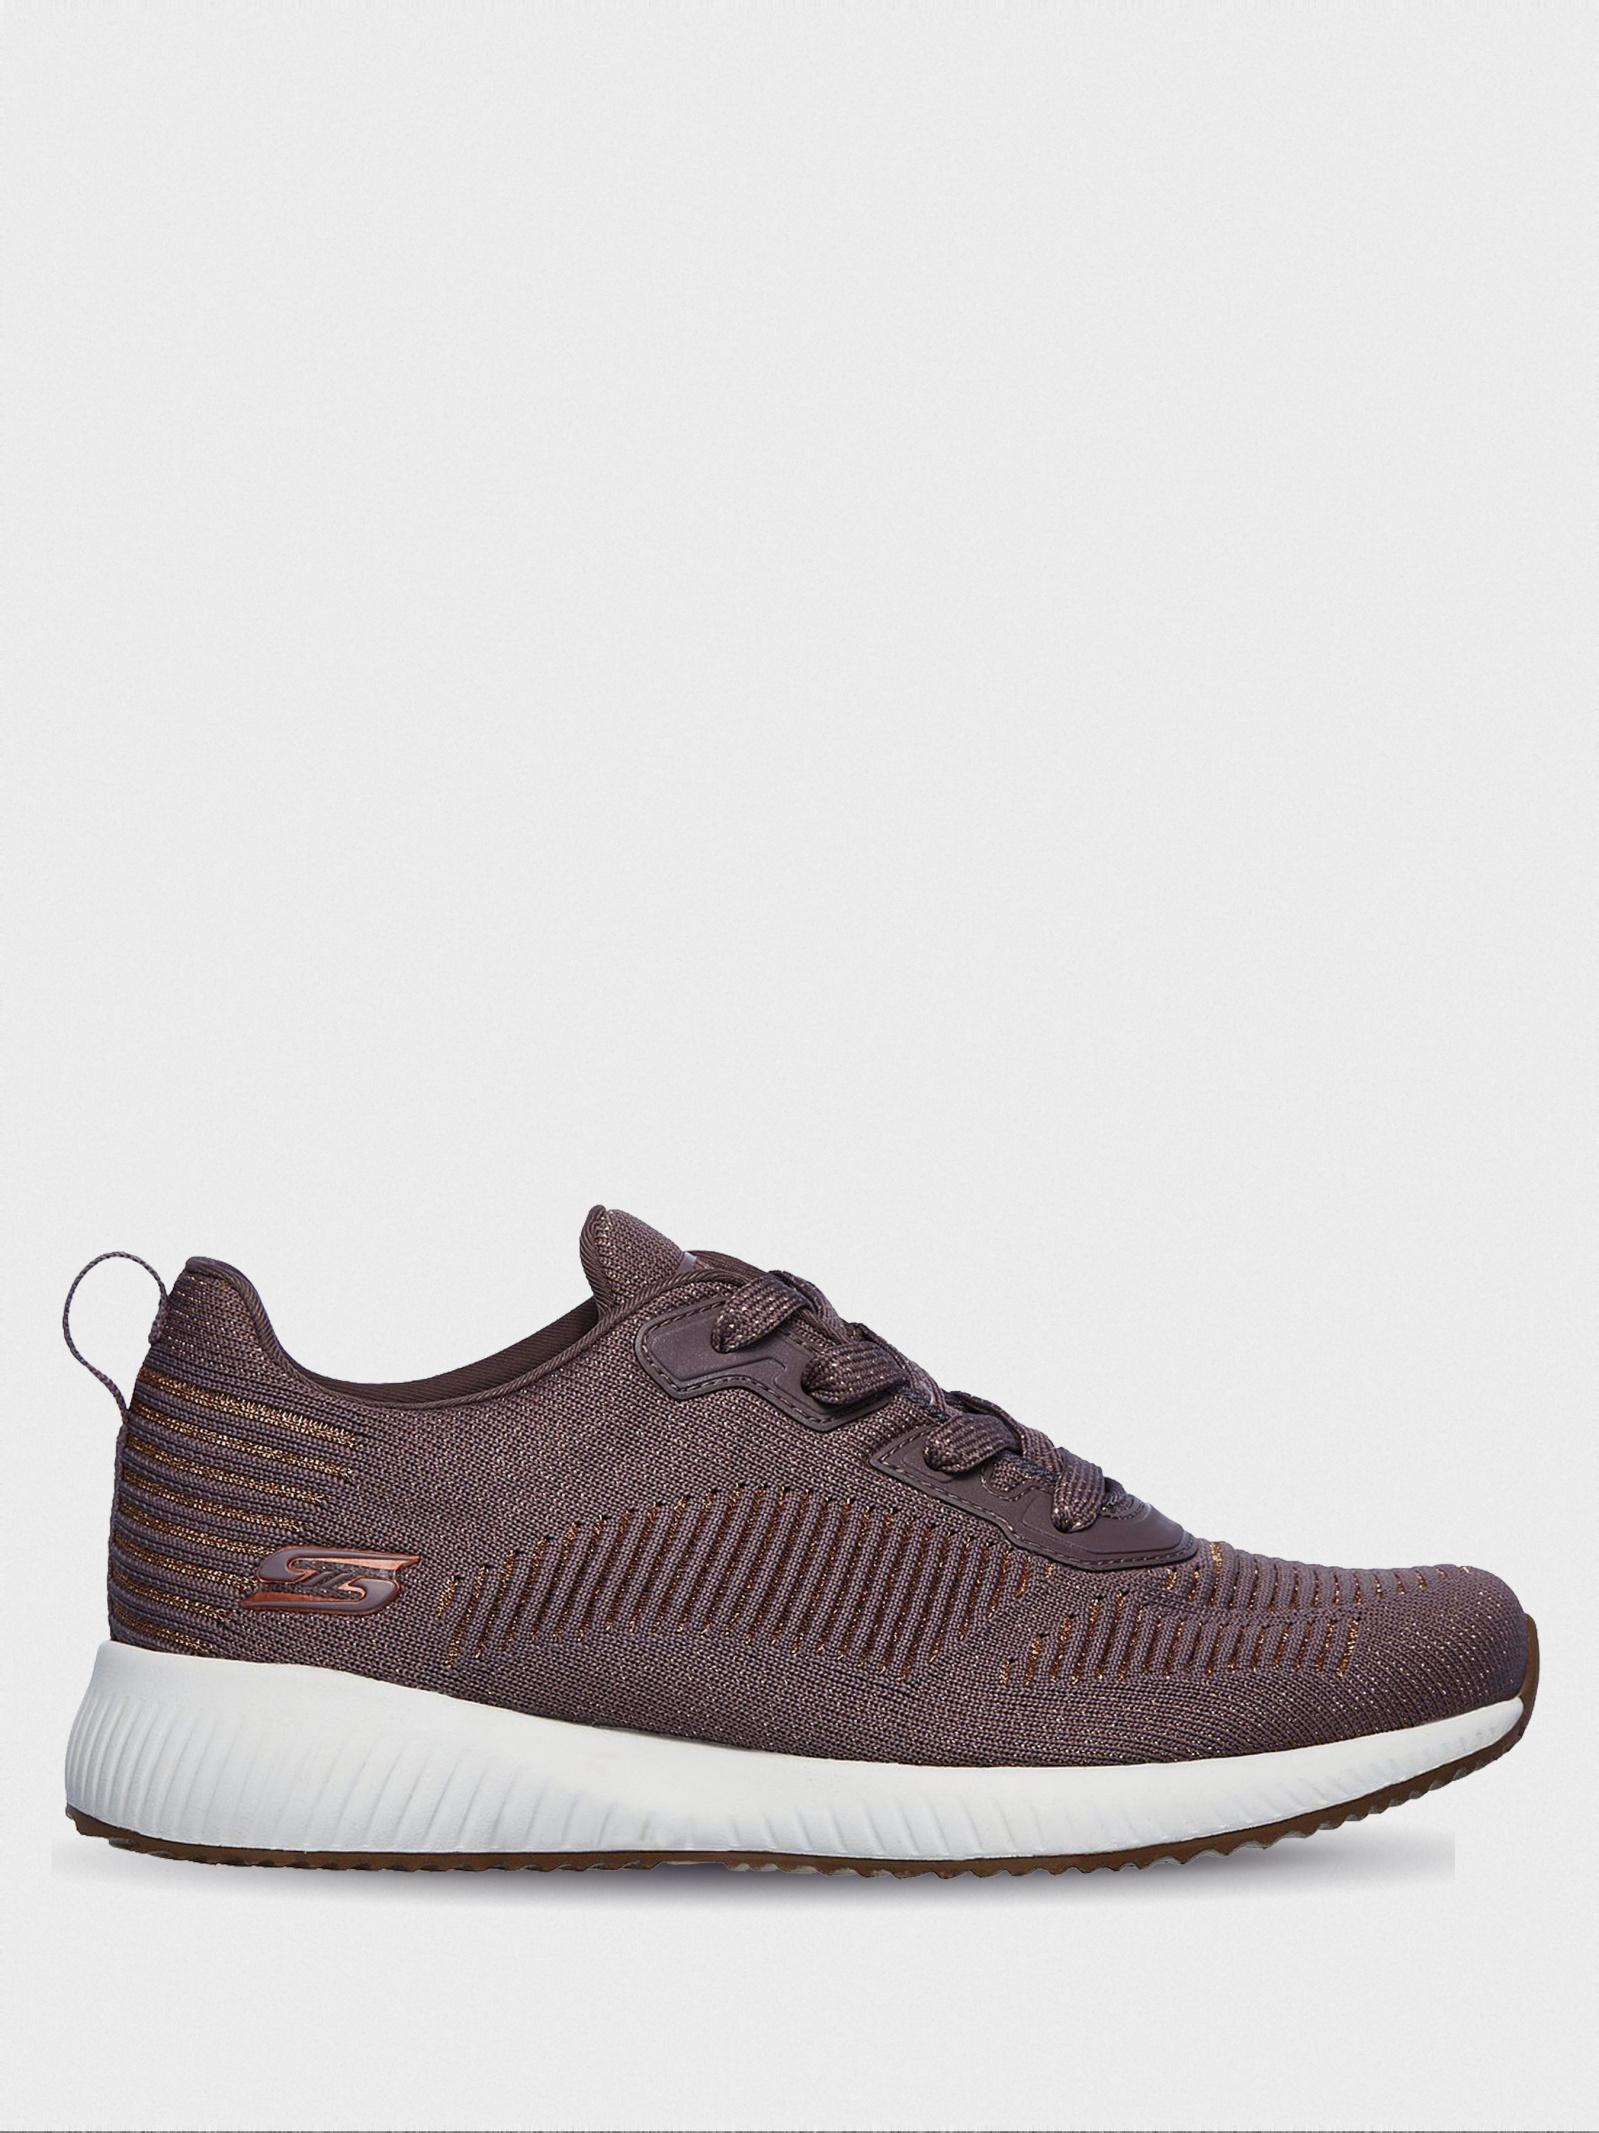 Кроссовки для женщин Skechers KW5185 продажа, 2017